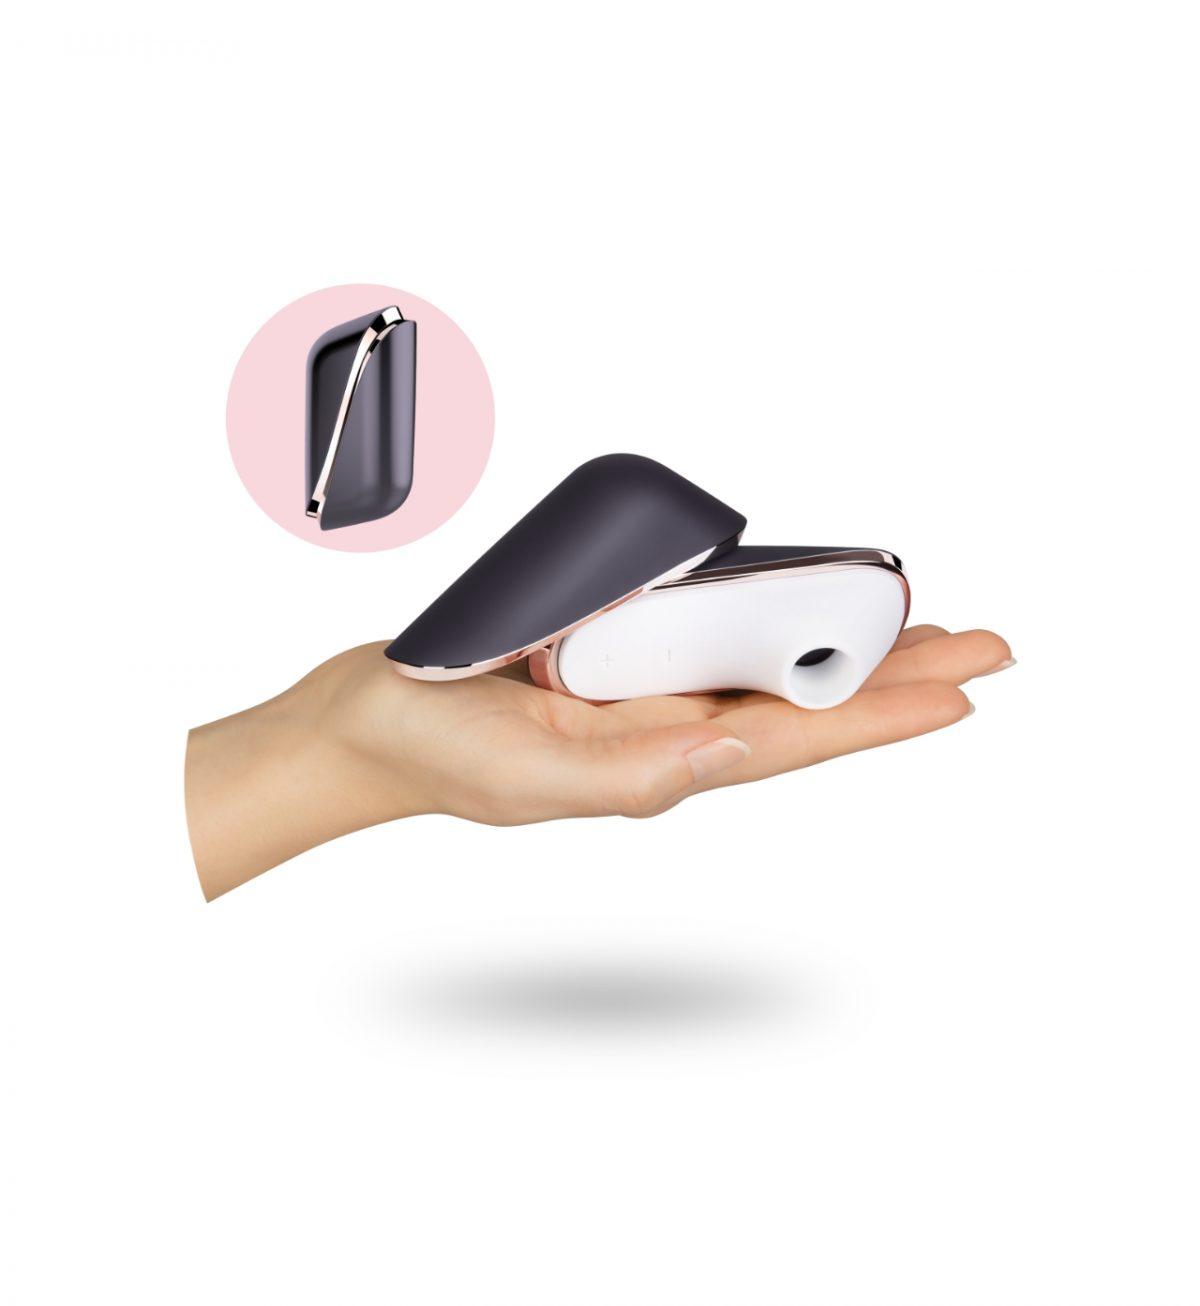 Pro Traveler - Klitorisstimulator med pulserende trykkbølger - Satisfyer